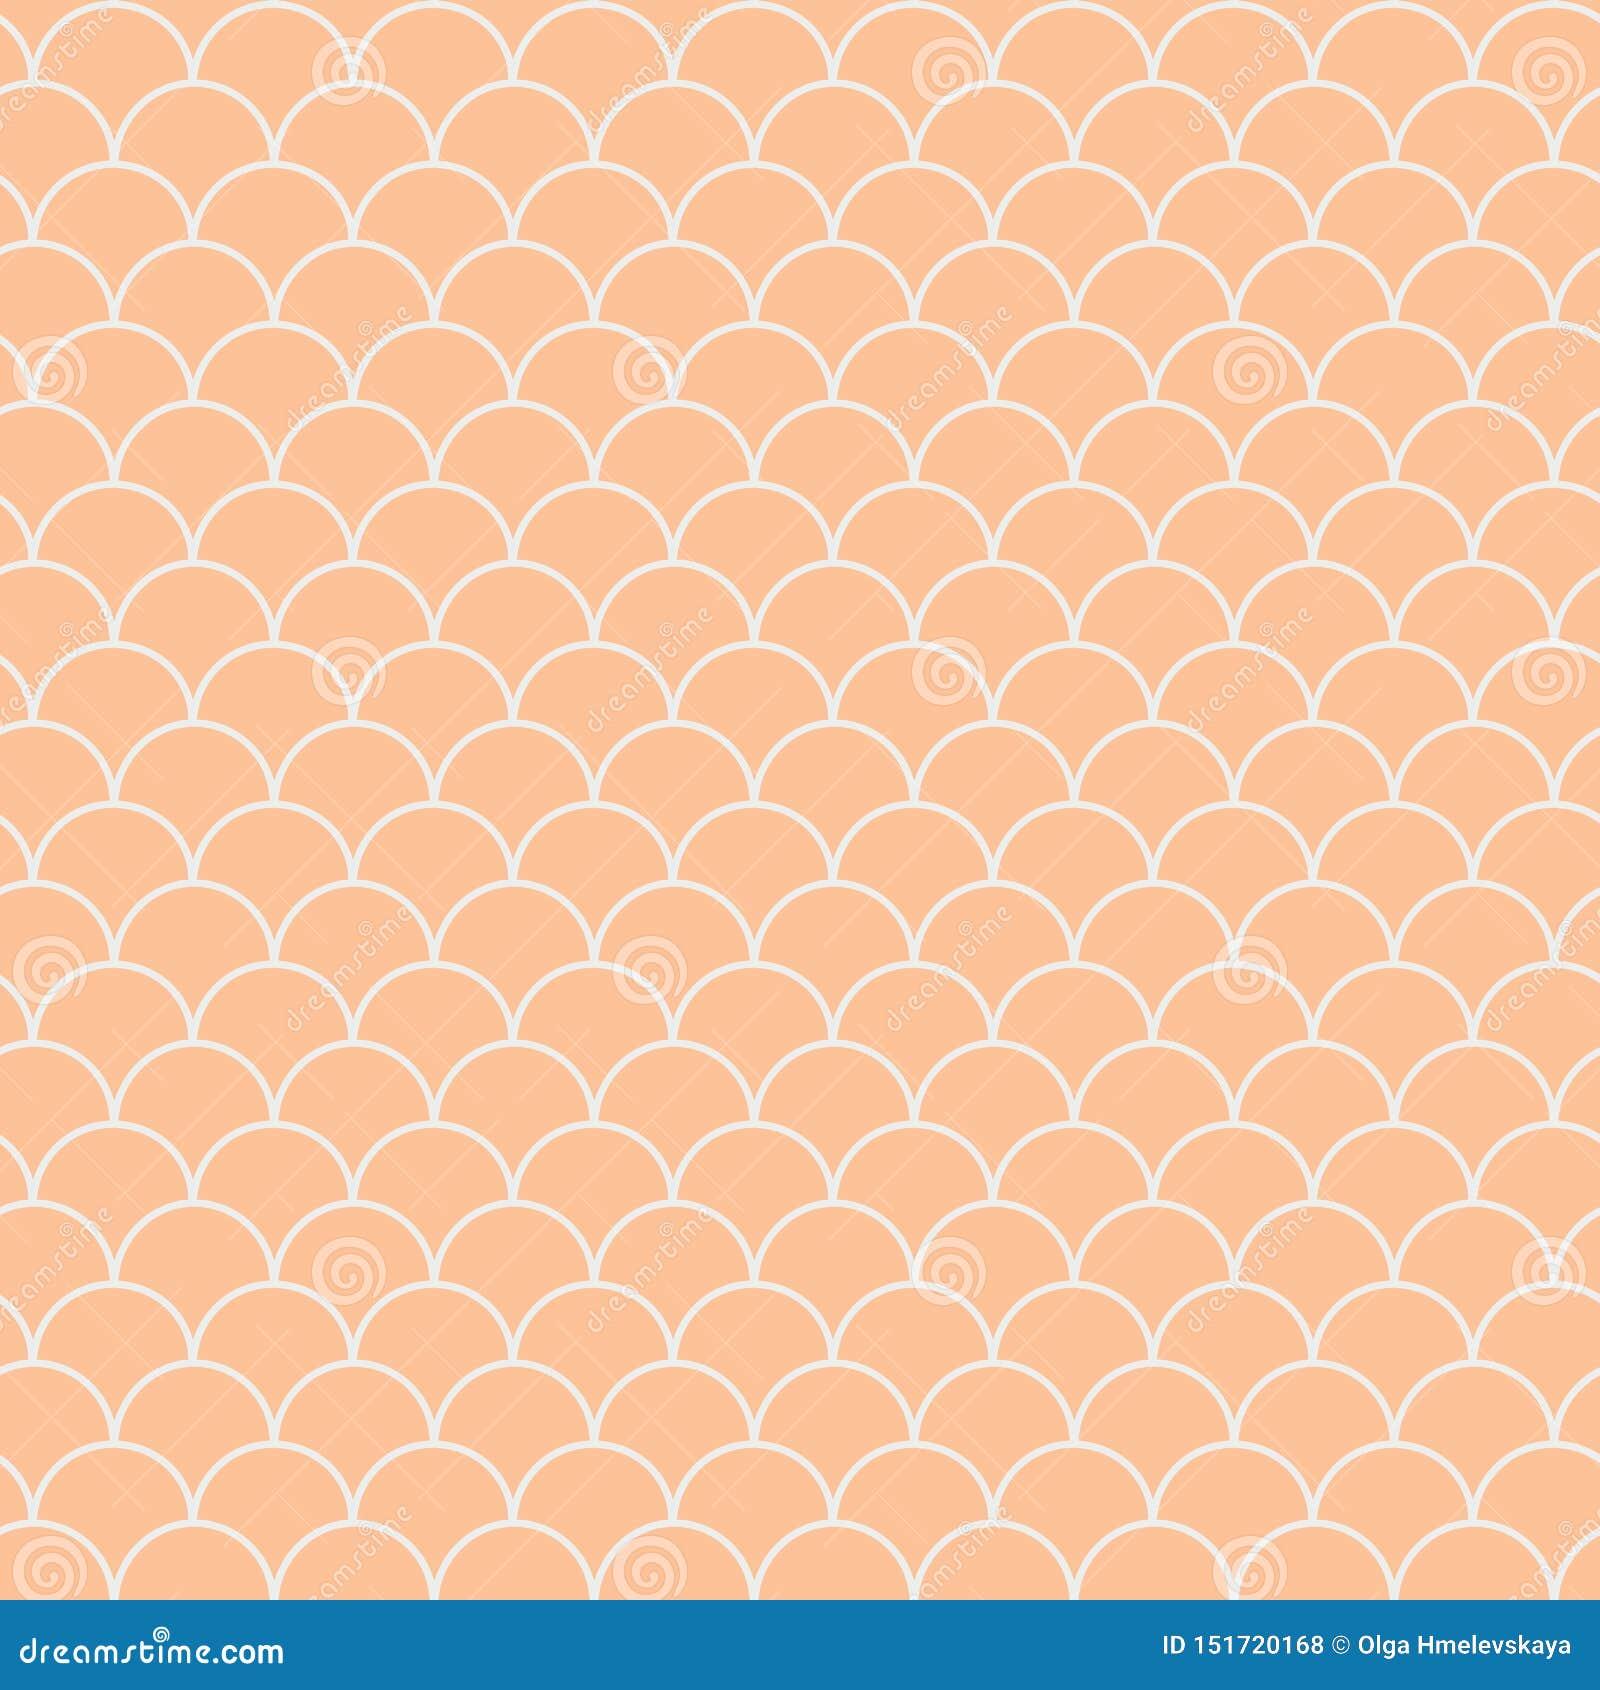 Mermaid Scale Seamless Pattern Stock Vector Illustration